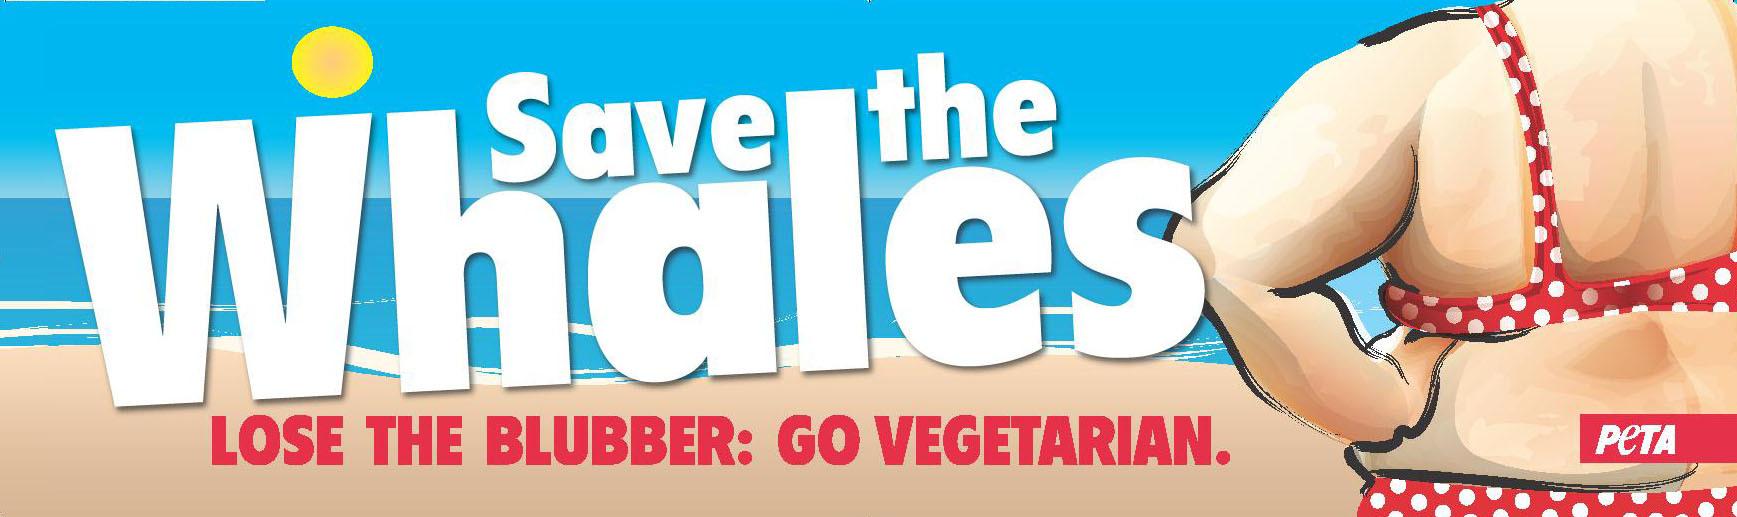 PETA-Save the whale. Lose the blubber